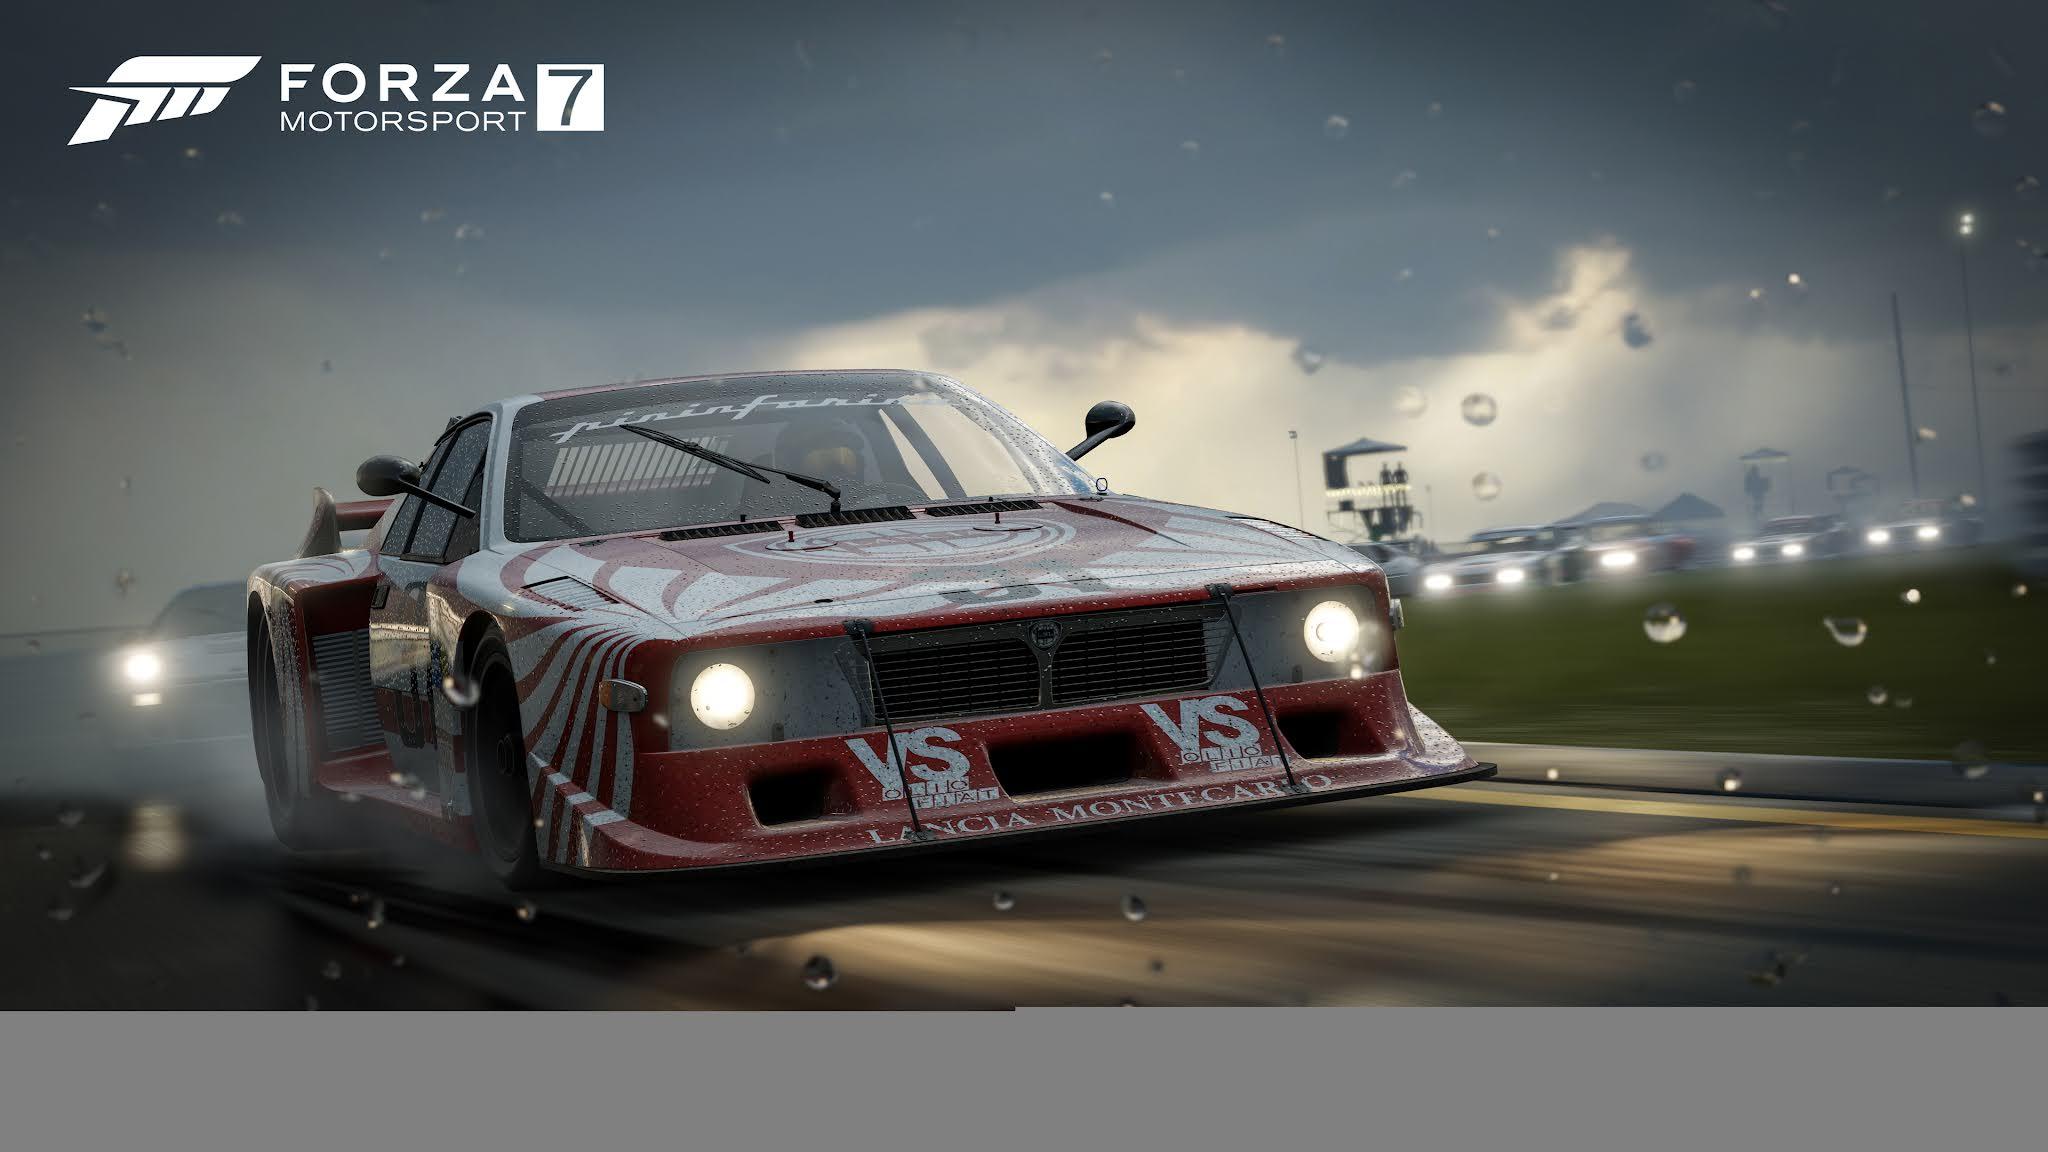 Forza Motorsport 7,2021 Forza Motorsport 7,2022 Forza Motorsport 7